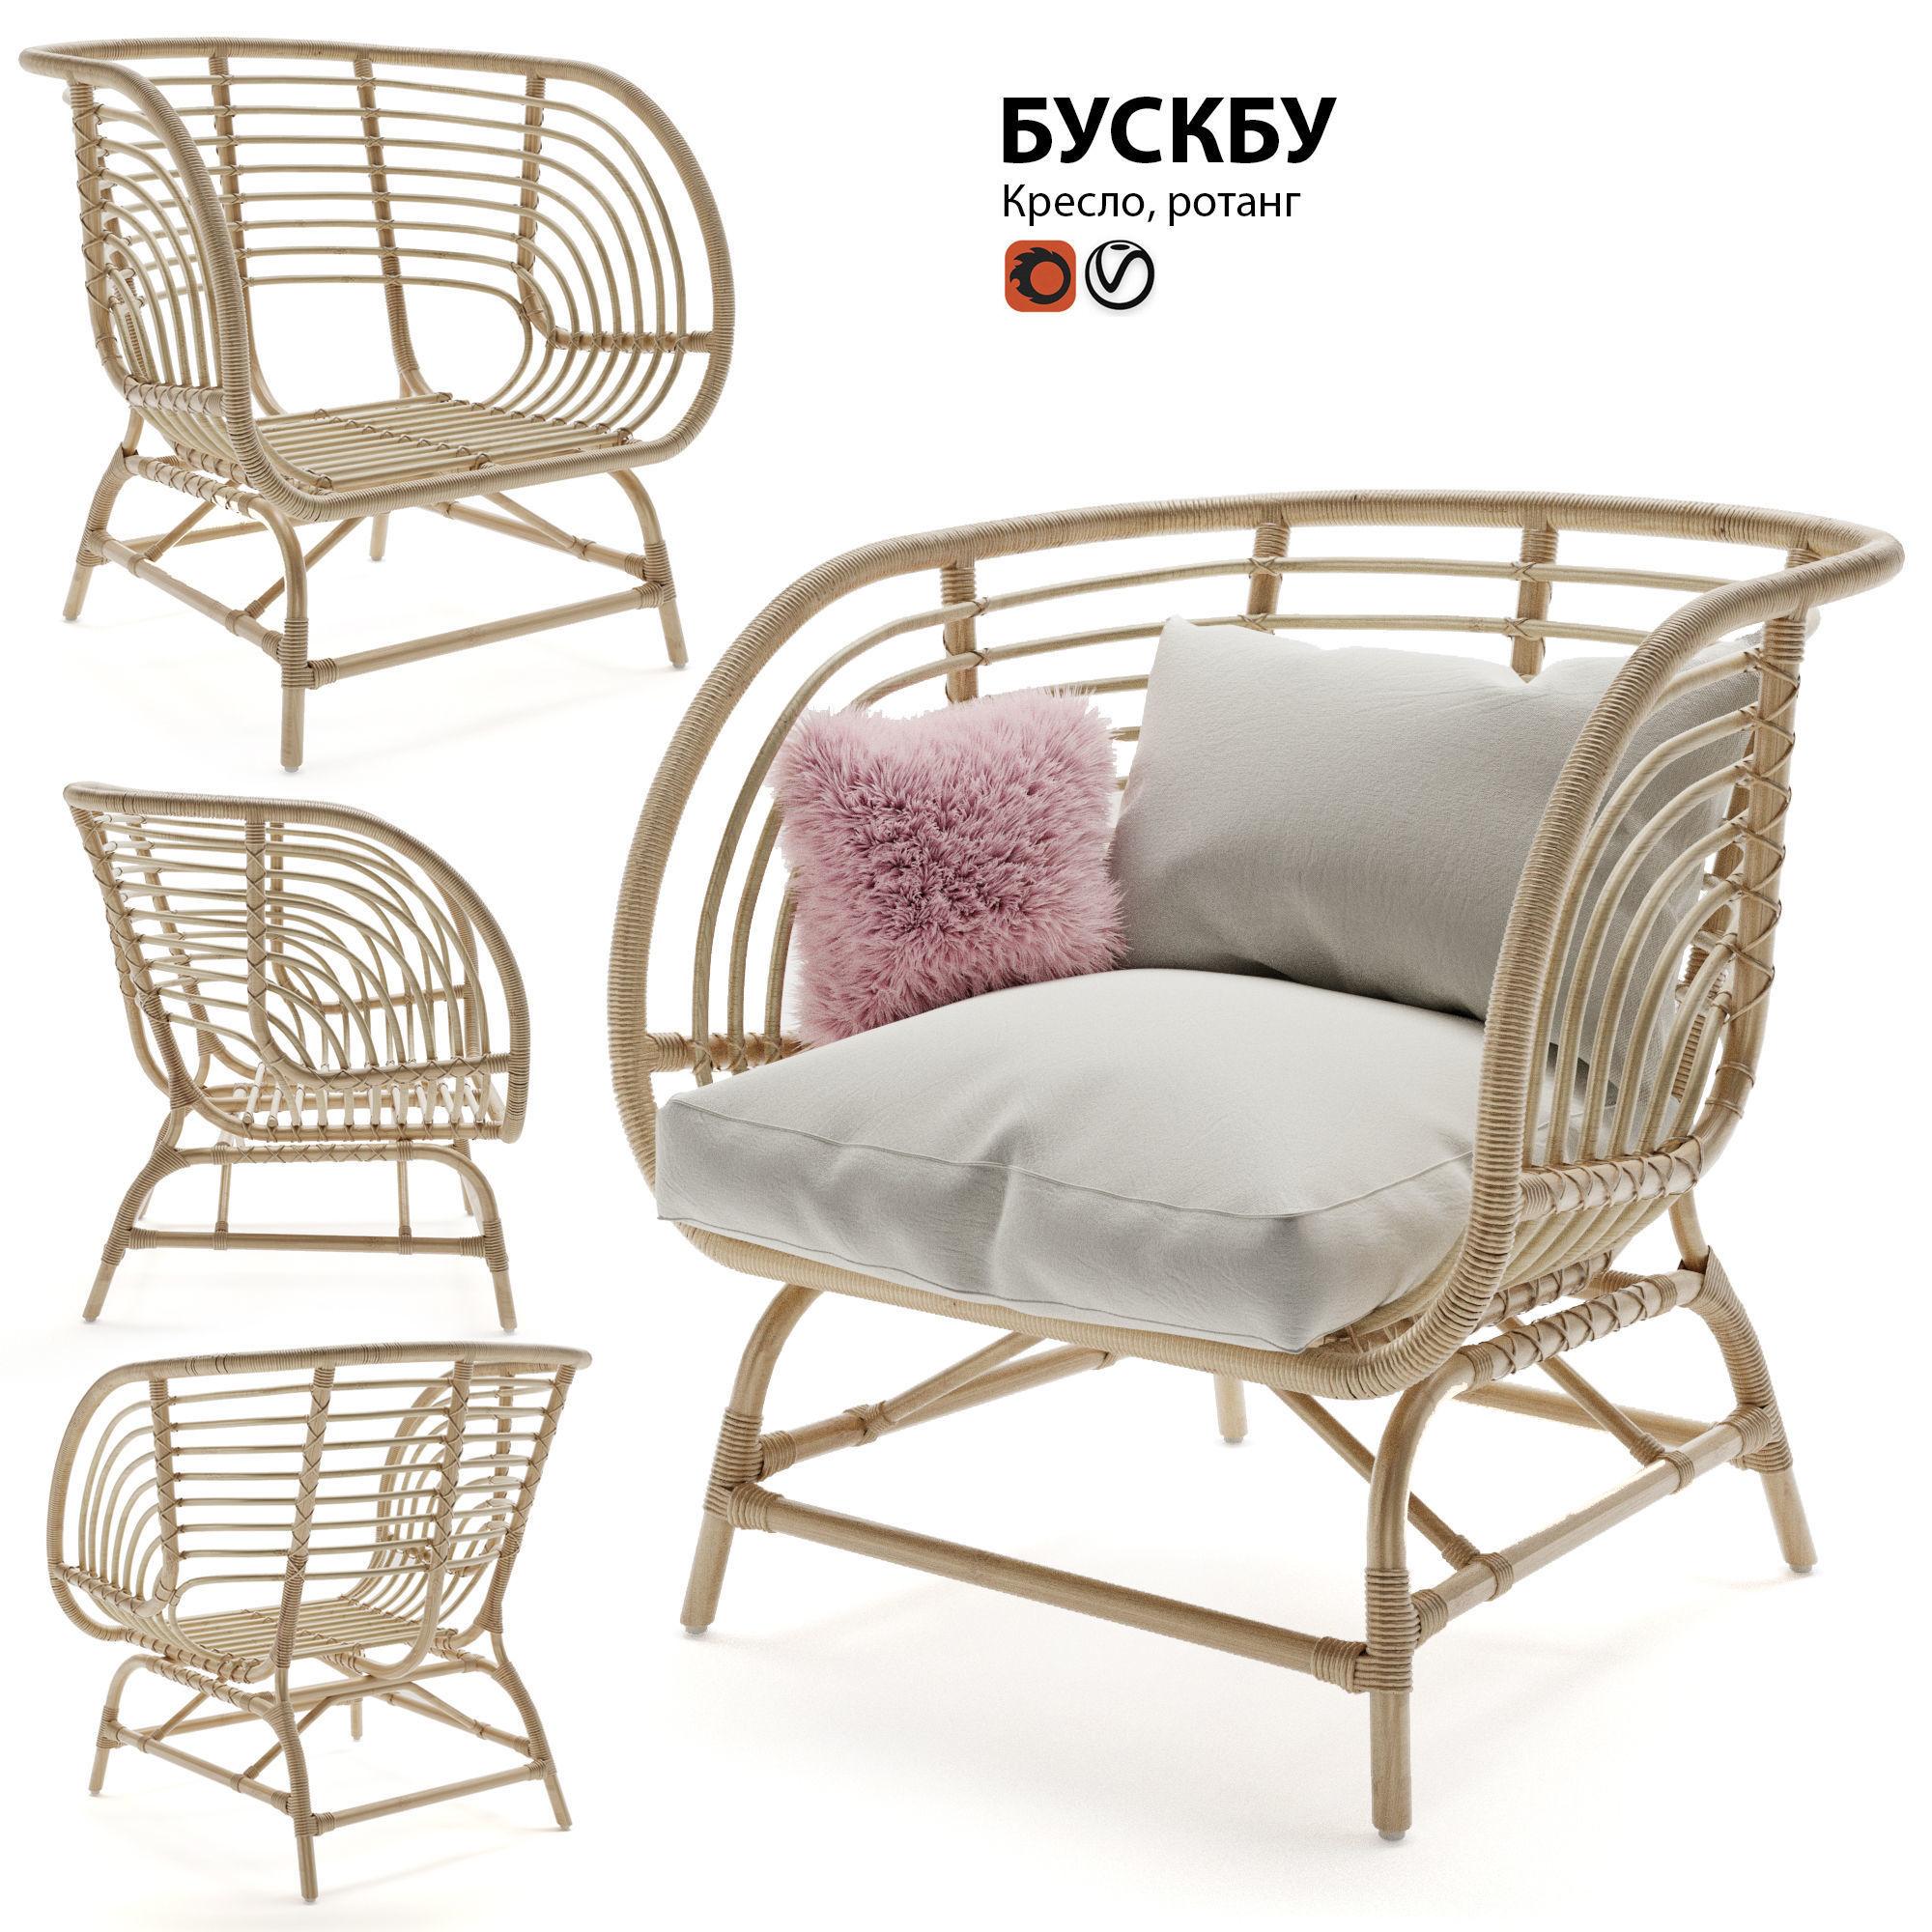 3d Ikea Buskbo Armchair Cgtrader